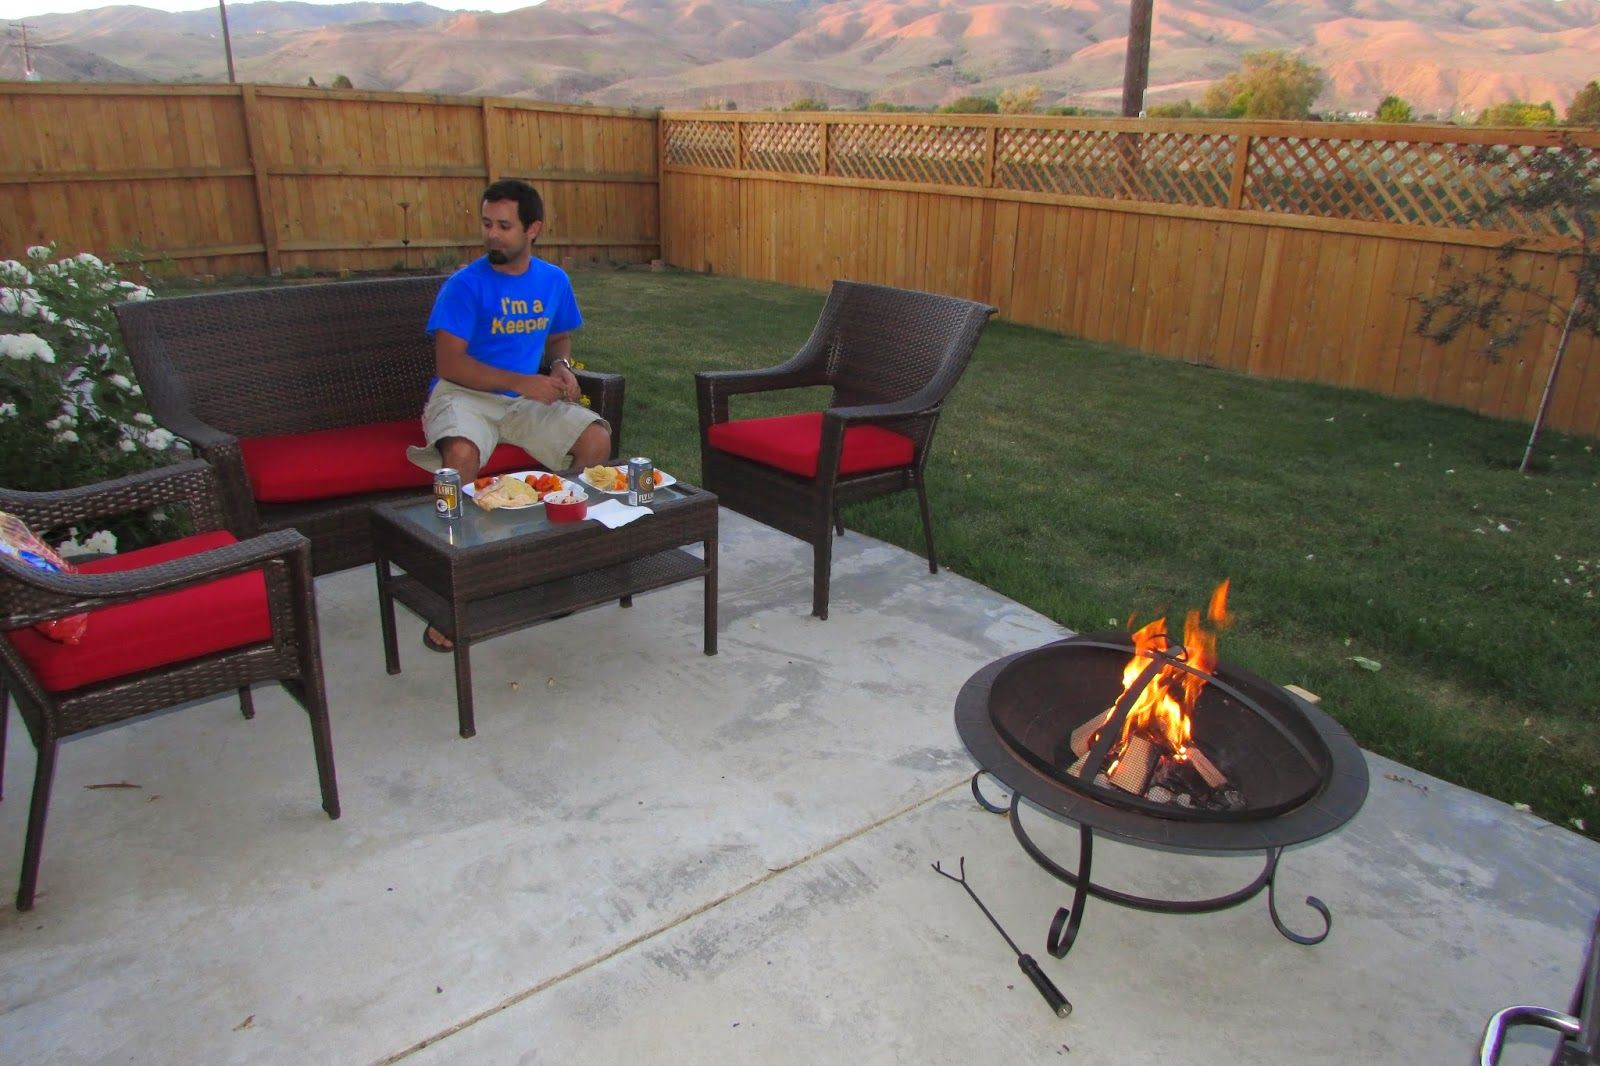 Fred Meyer patio set & fire pit | Fire pit, Fire pit patio ...